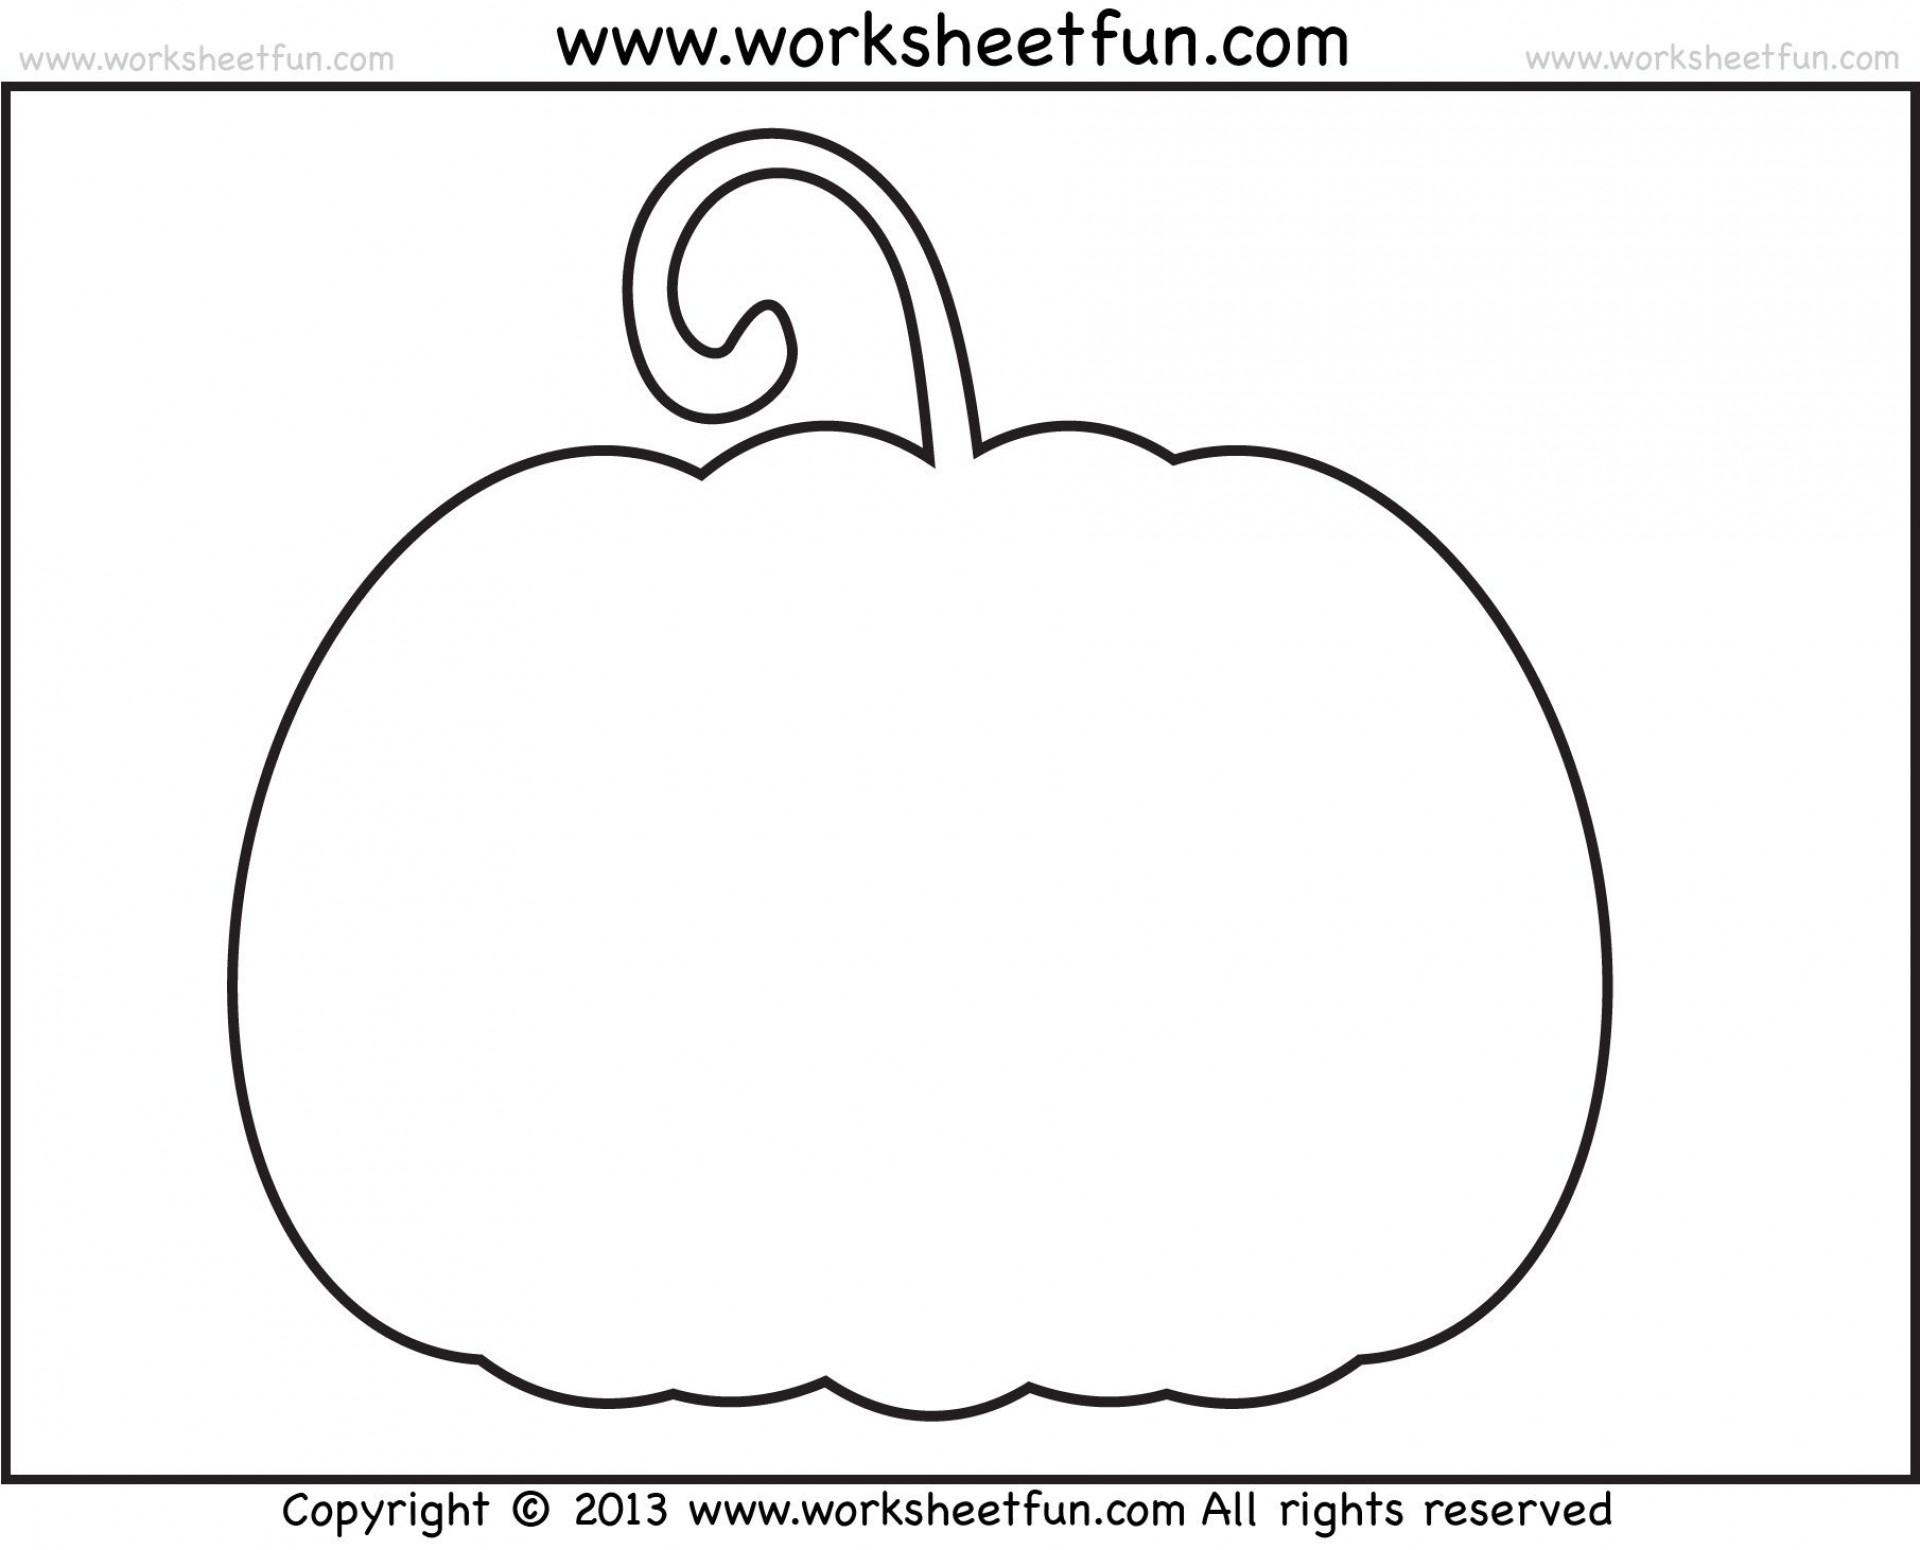 001 Wondrou Free Pumpkin Template Printable Design  Easy Carving Scary Stencil1920